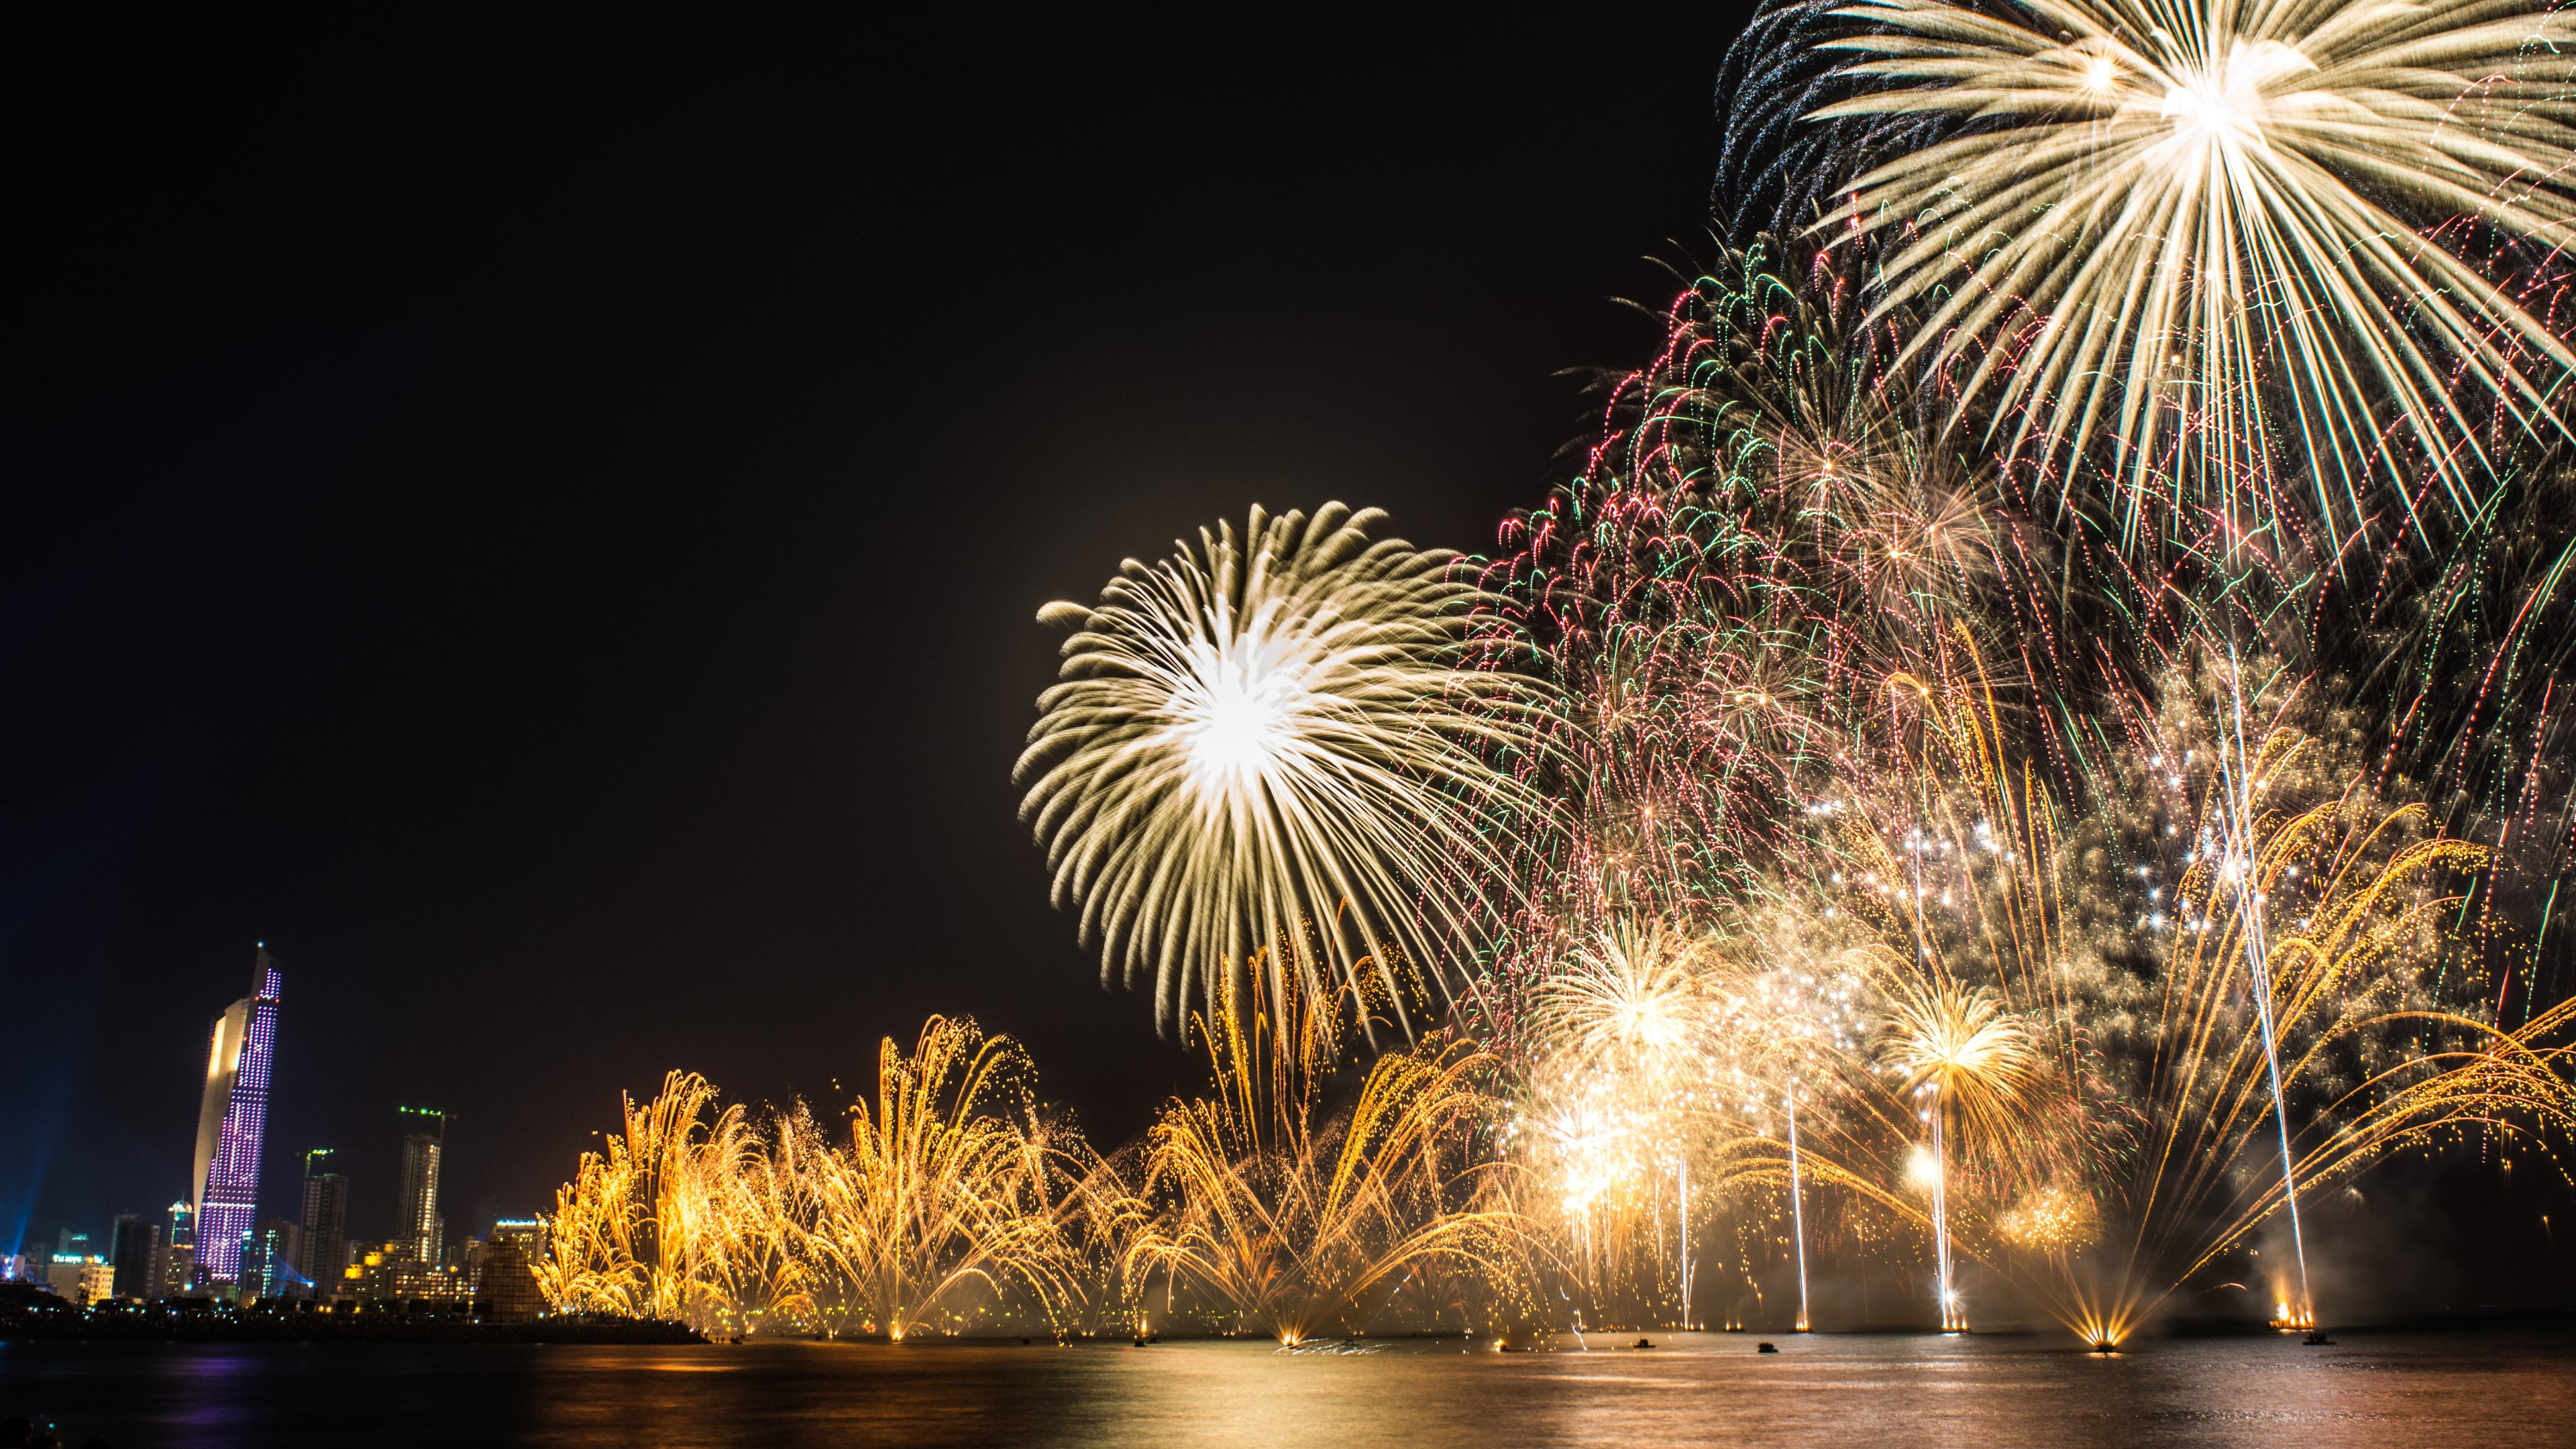 fireworks Computer Wallpapers Desktop Backgrounds 3840x2160 ID 3840x2160